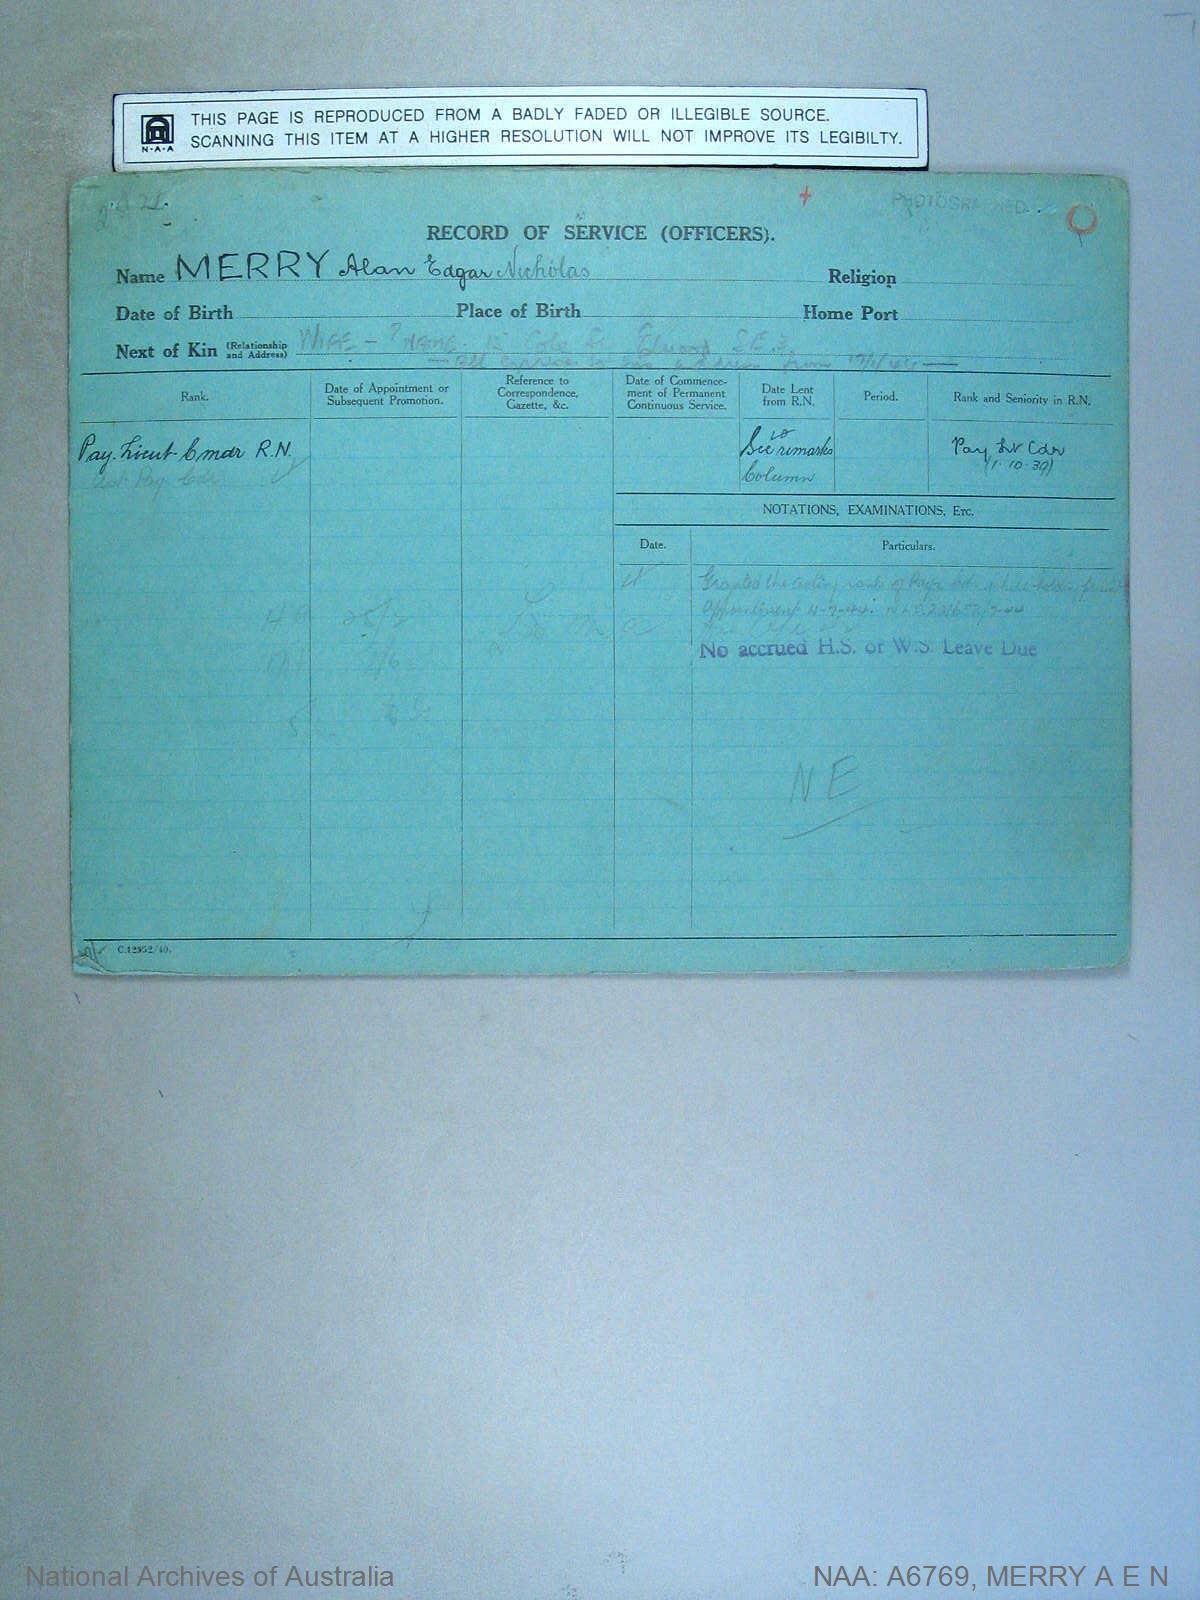 MERRY ALAN EDGAR NICHOLAS : Date of birth - Unknown : Place of birth - Unknown : Place of enlistment - Unknown : Next of Kin - Unknown